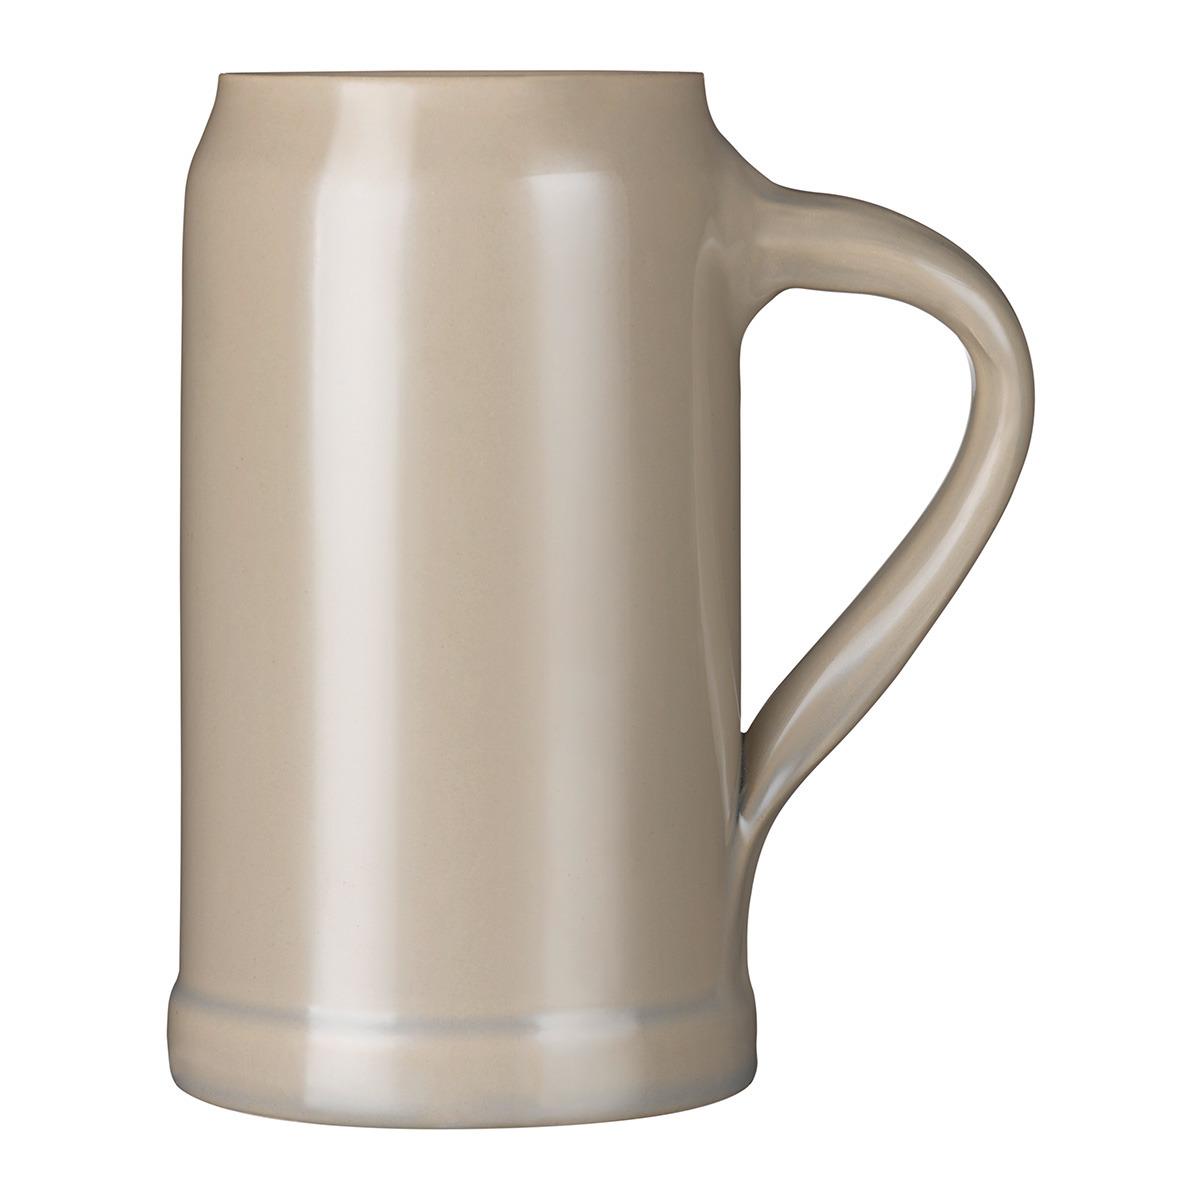 Jarra de cerveza de cerámica El Corte Inglés